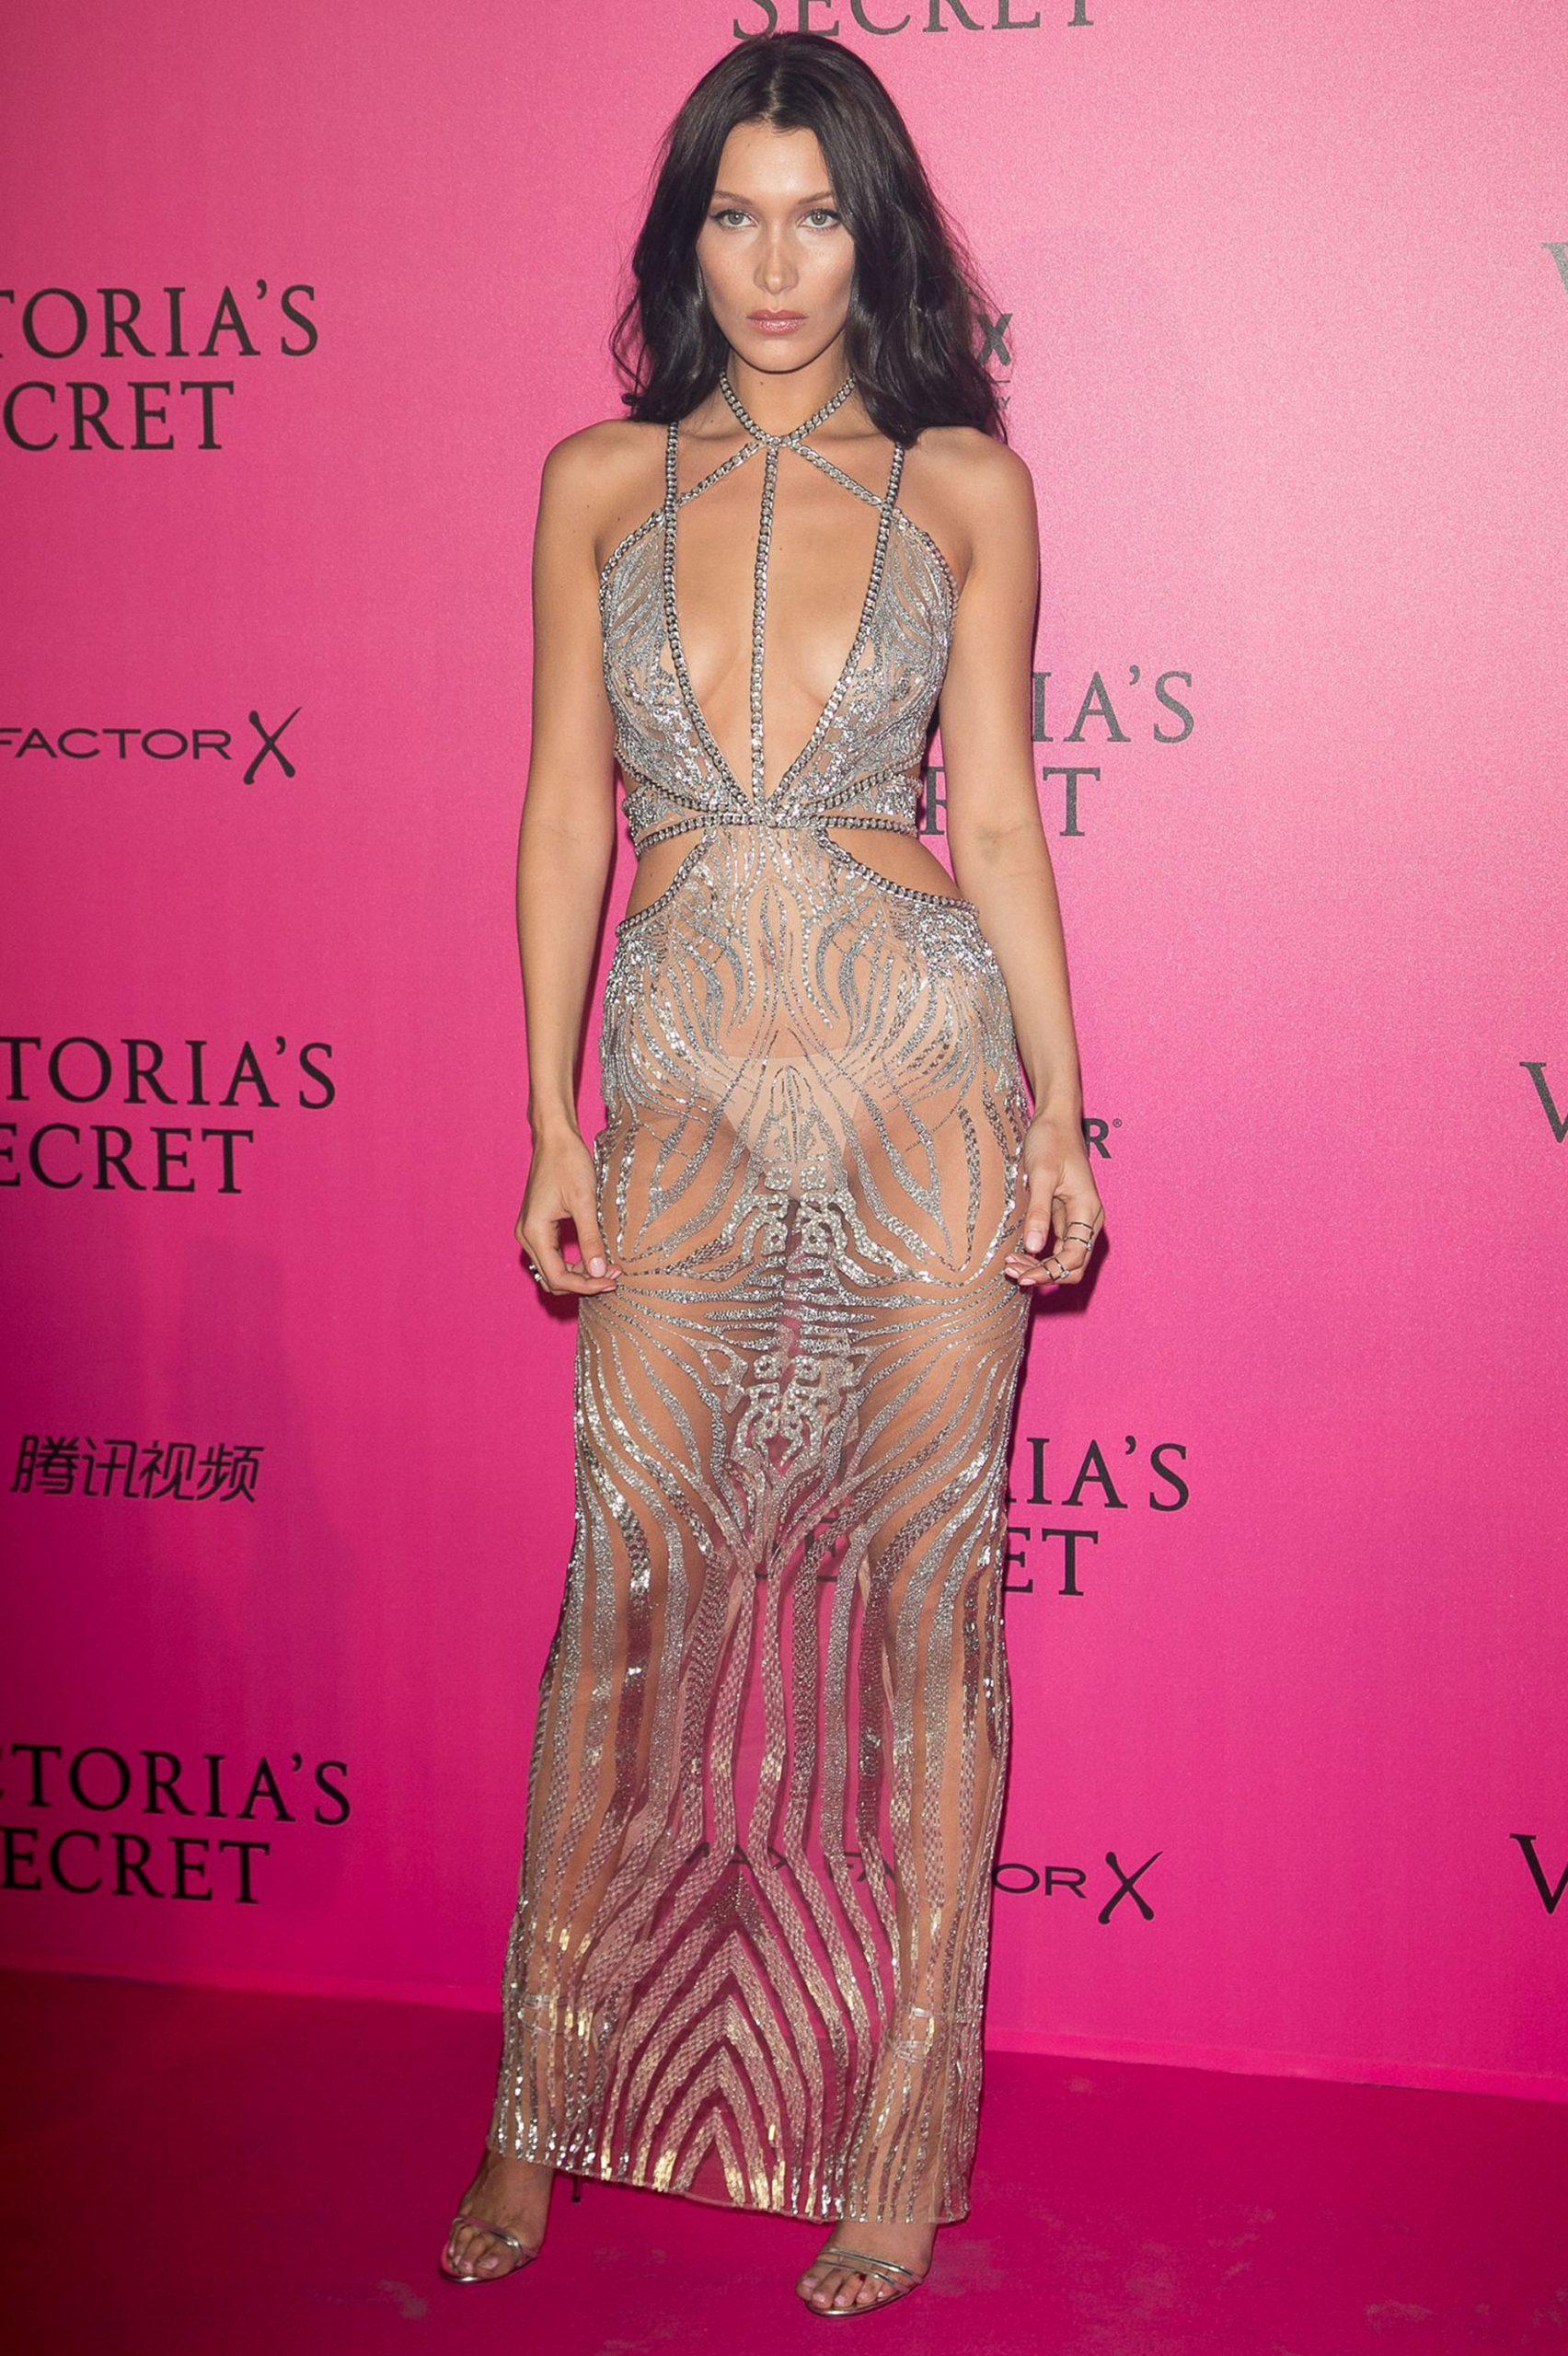 Bella Hadid naked dress - Neomag.